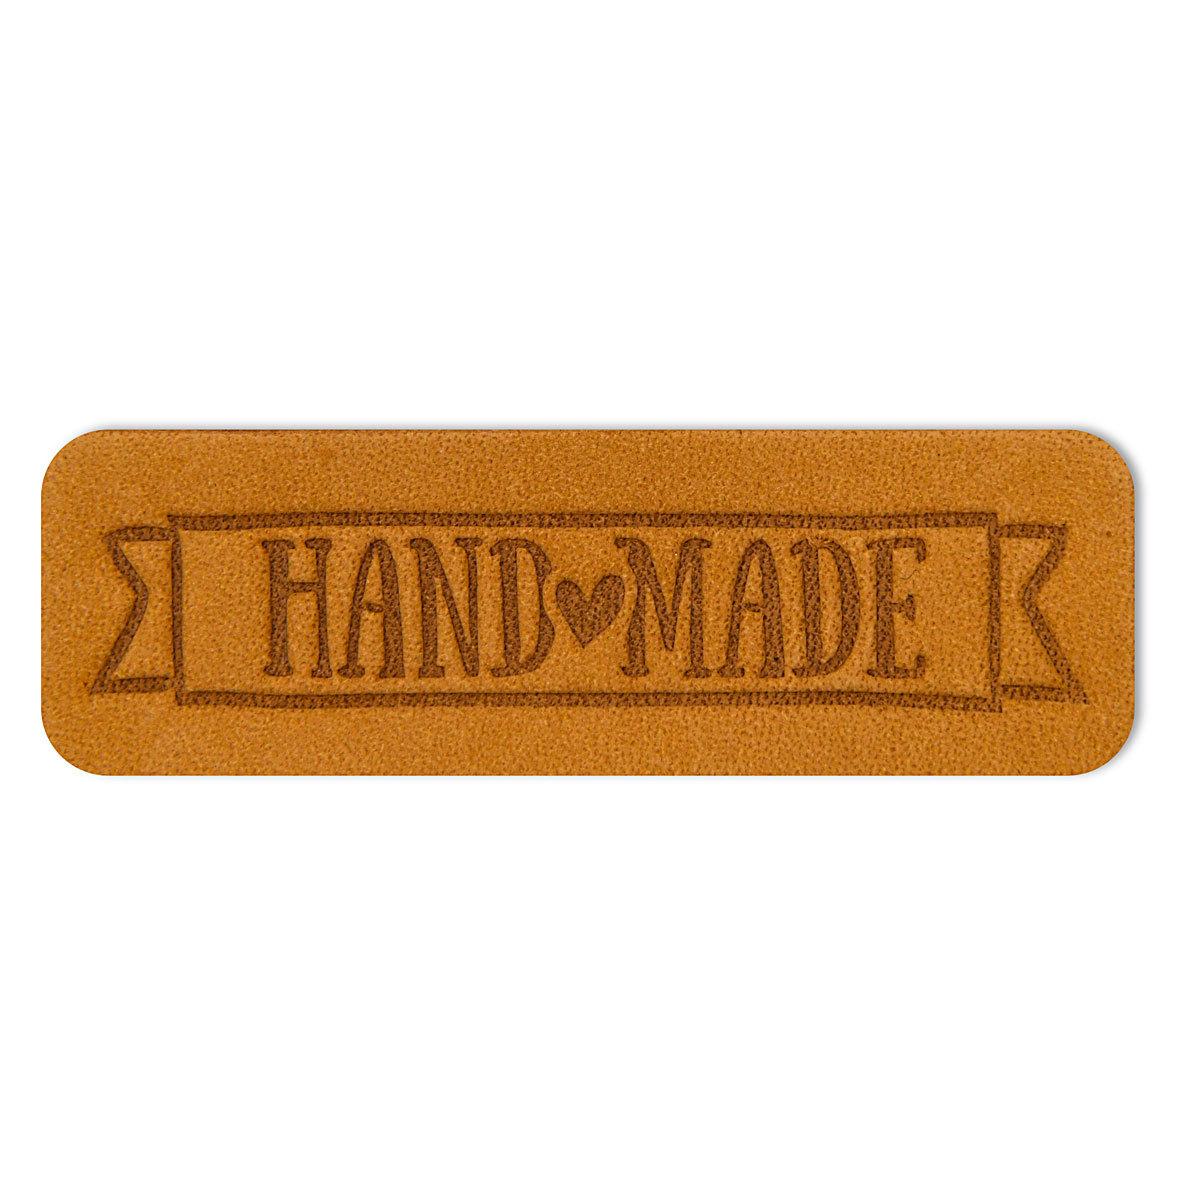 3 Термоаппликация из кожи Hand Made 5,65*1,8см, 100% кожа